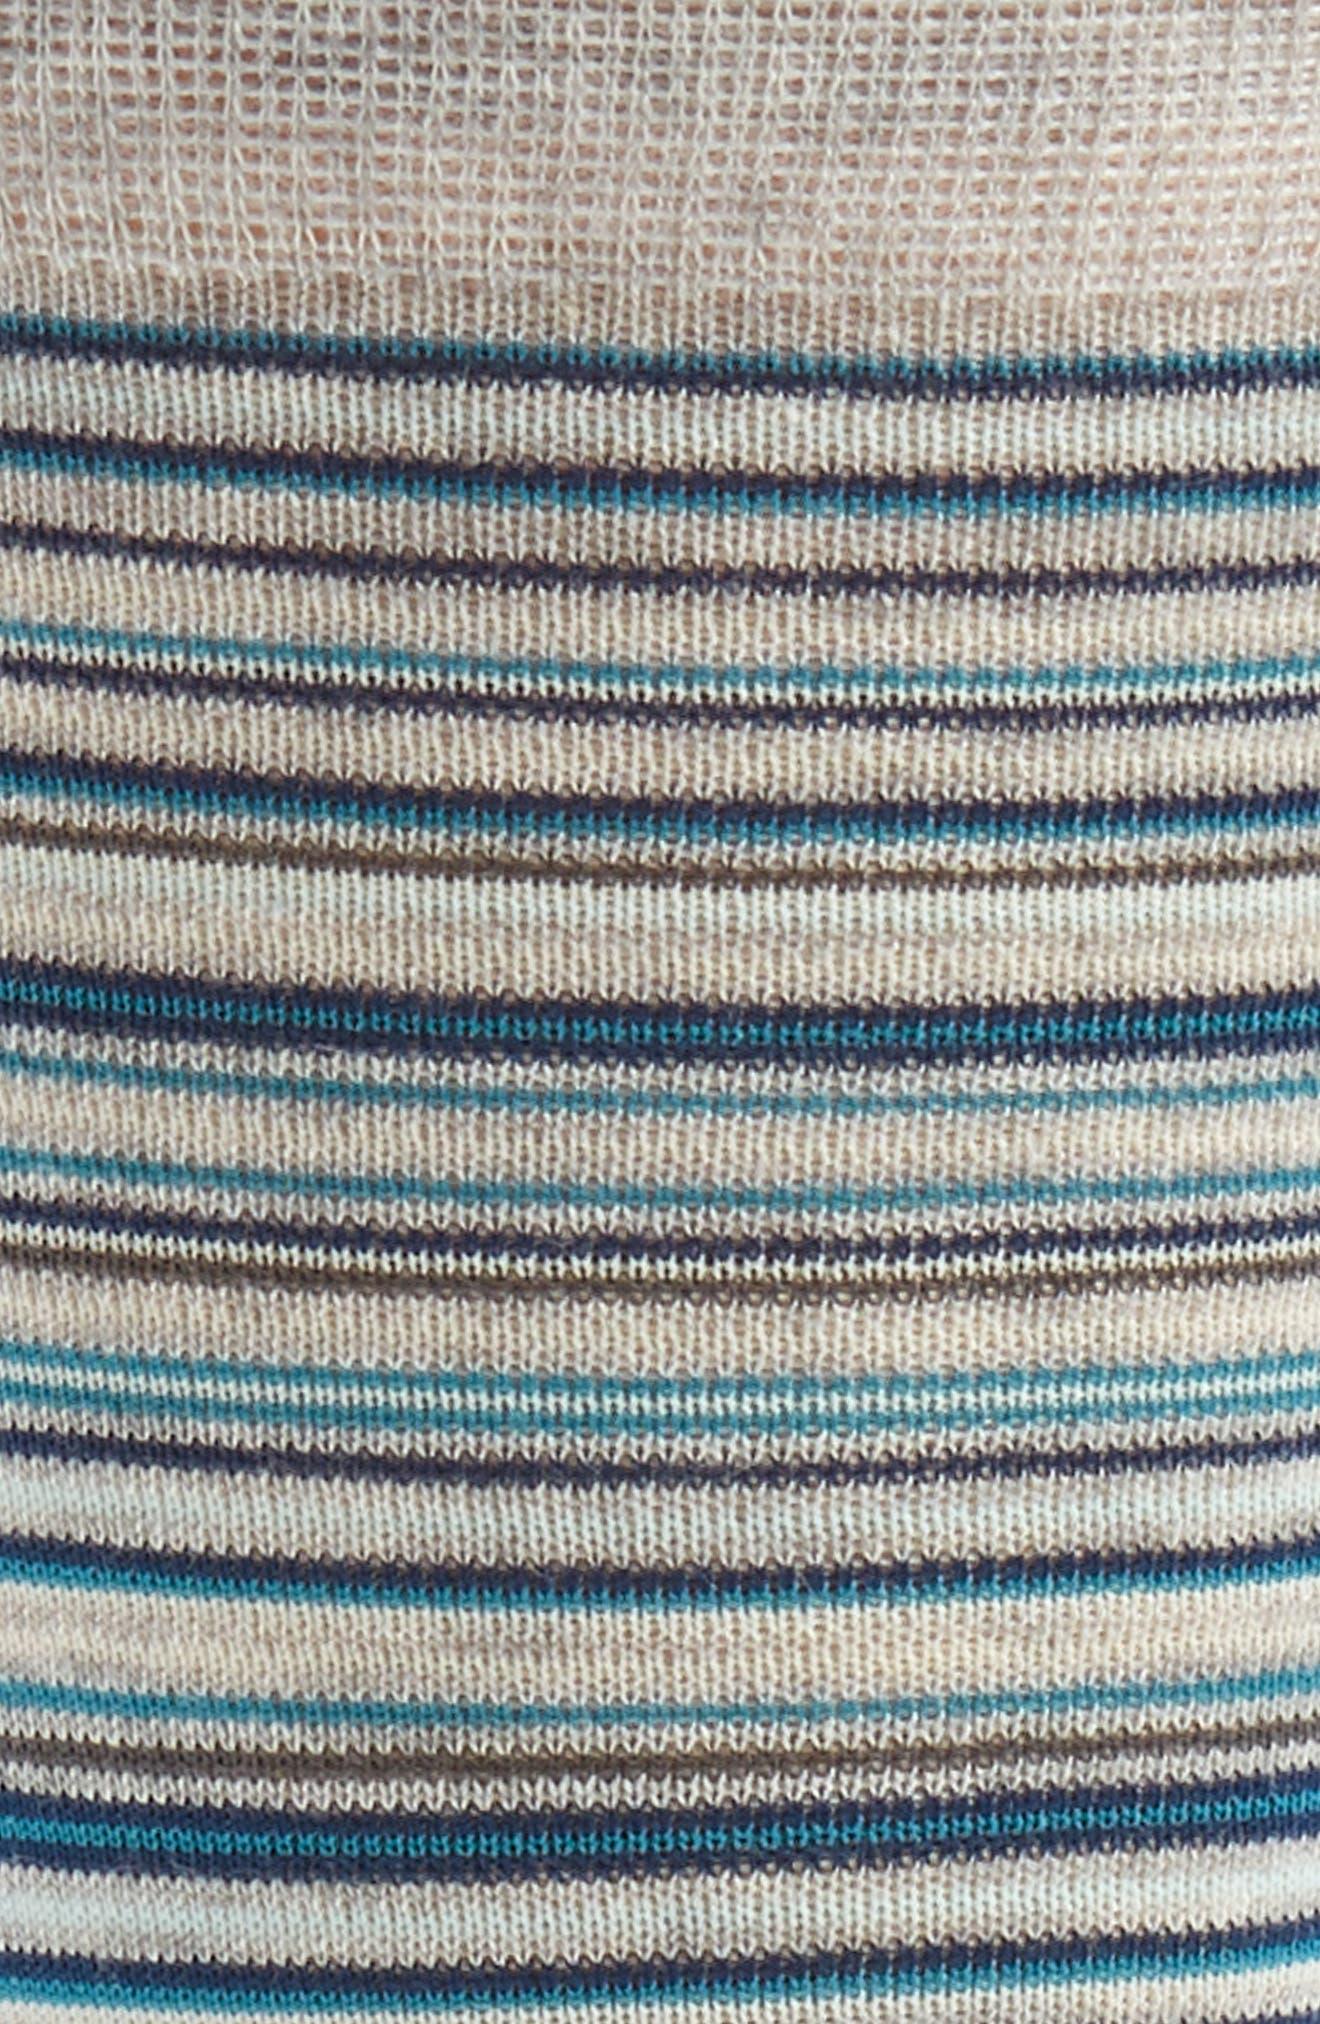 Multistripe Crew Socks,                             Alternate thumbnail 15, color,